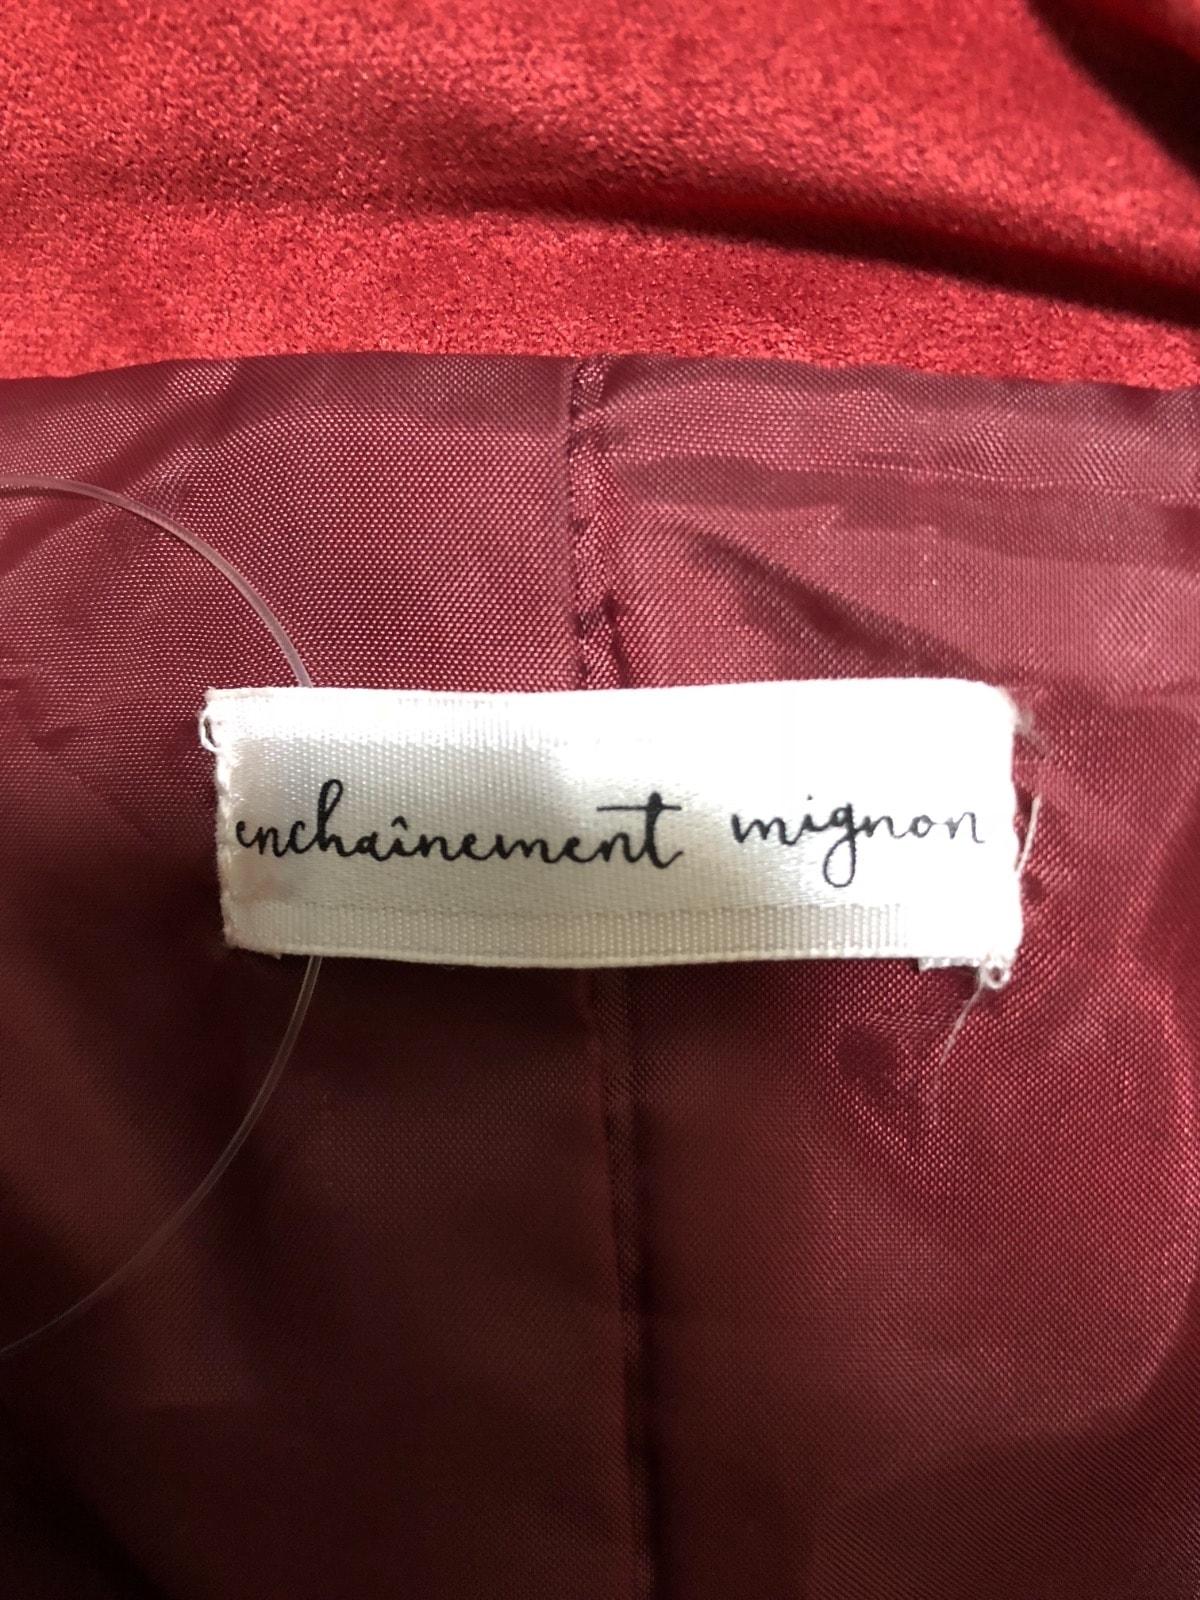 enchainement mignon(アンシェヌマンミニョン)のコート